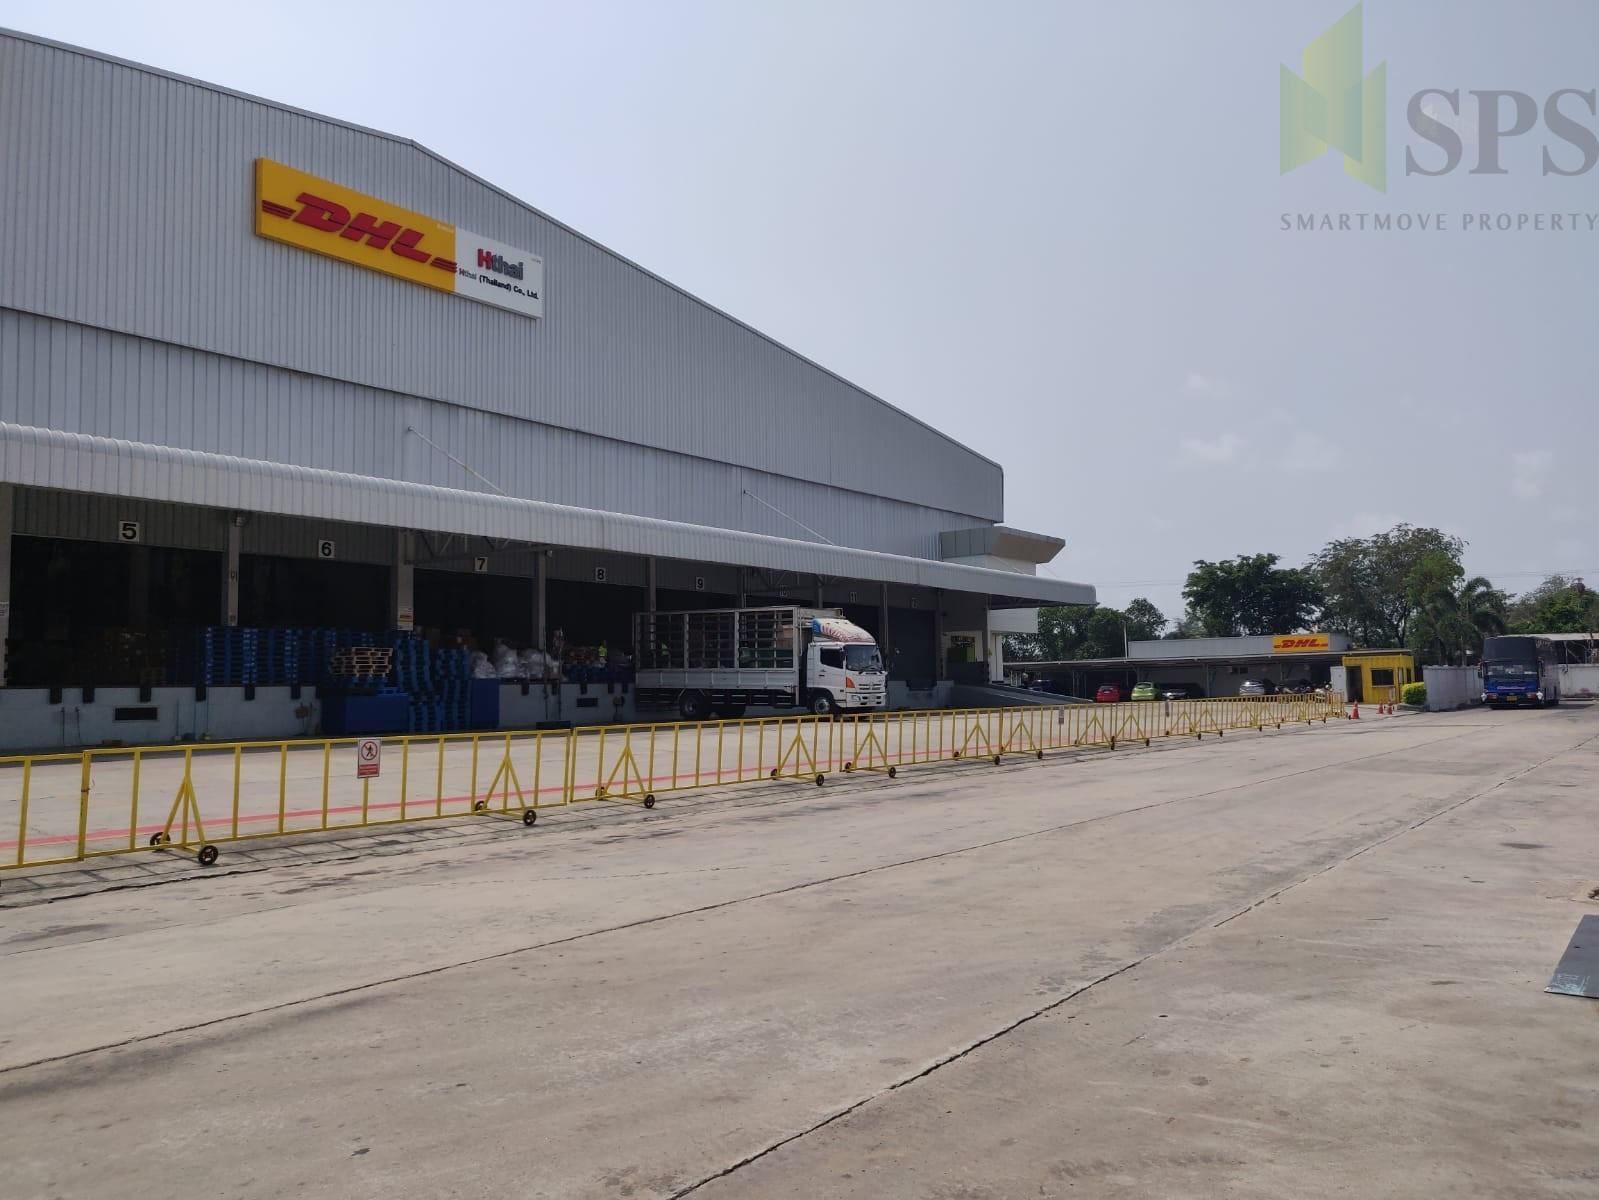 Warehouse/Factory for RENT at Bangna Trat KM19โกดังให้เช่า โรงงานให้เช่า กม.19 ( SPS-PPW005 )